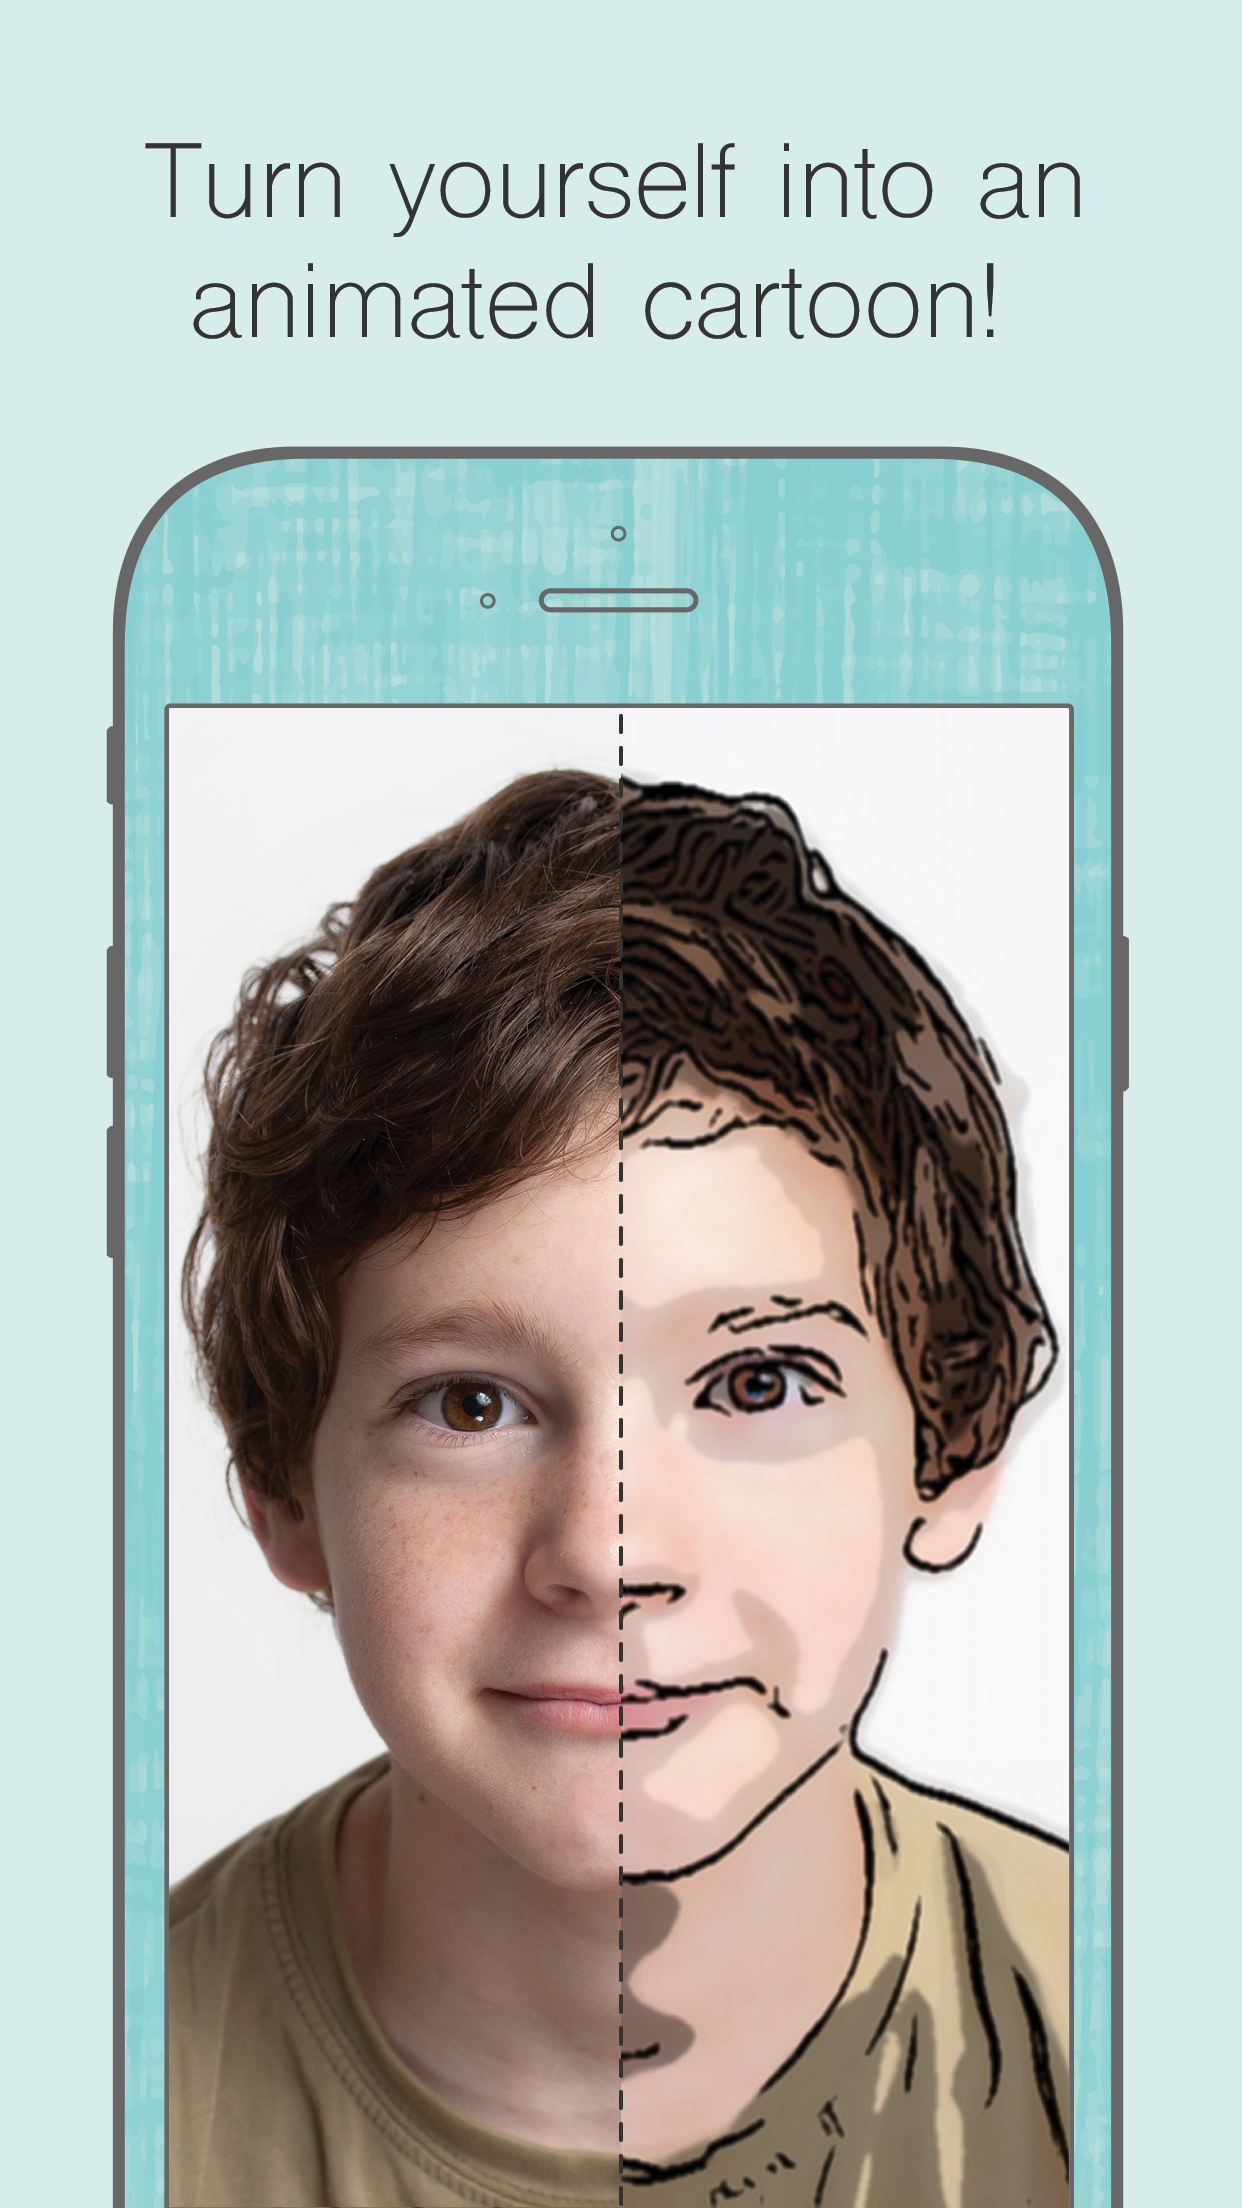 Cartoon Face animation creator Screenshot